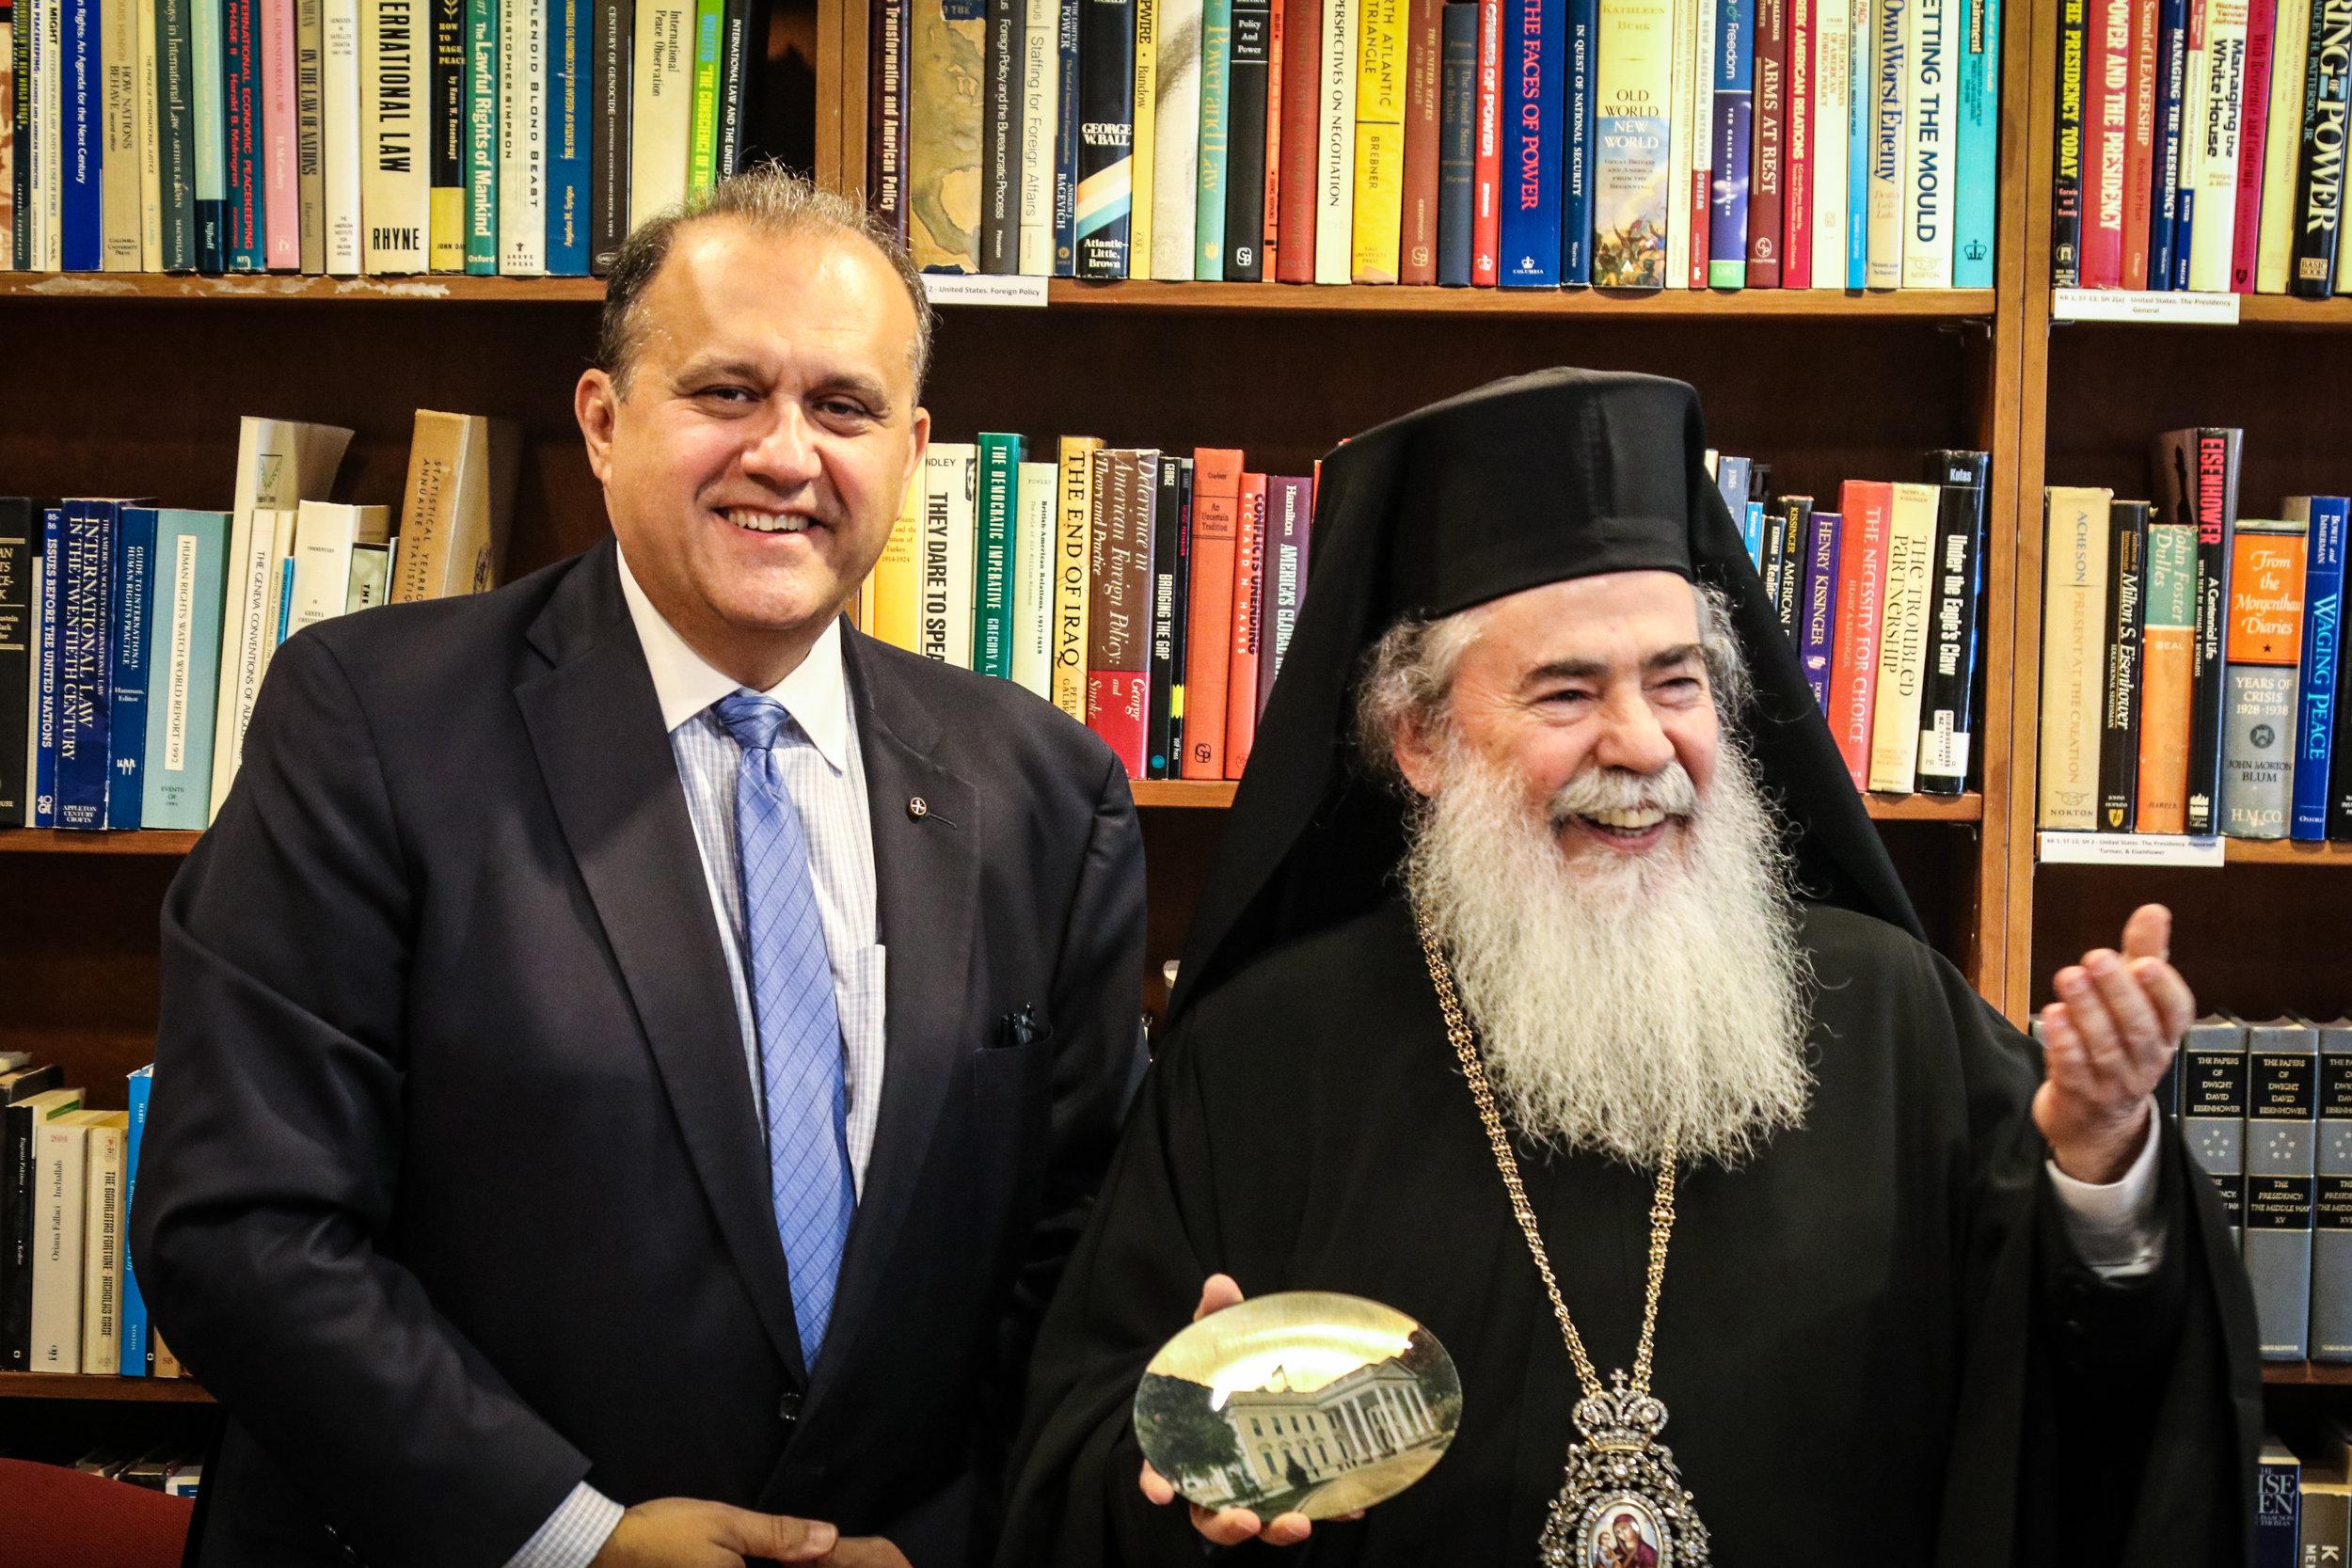 Nick Larigakis presents a memento to Patriarch Theophilos III.